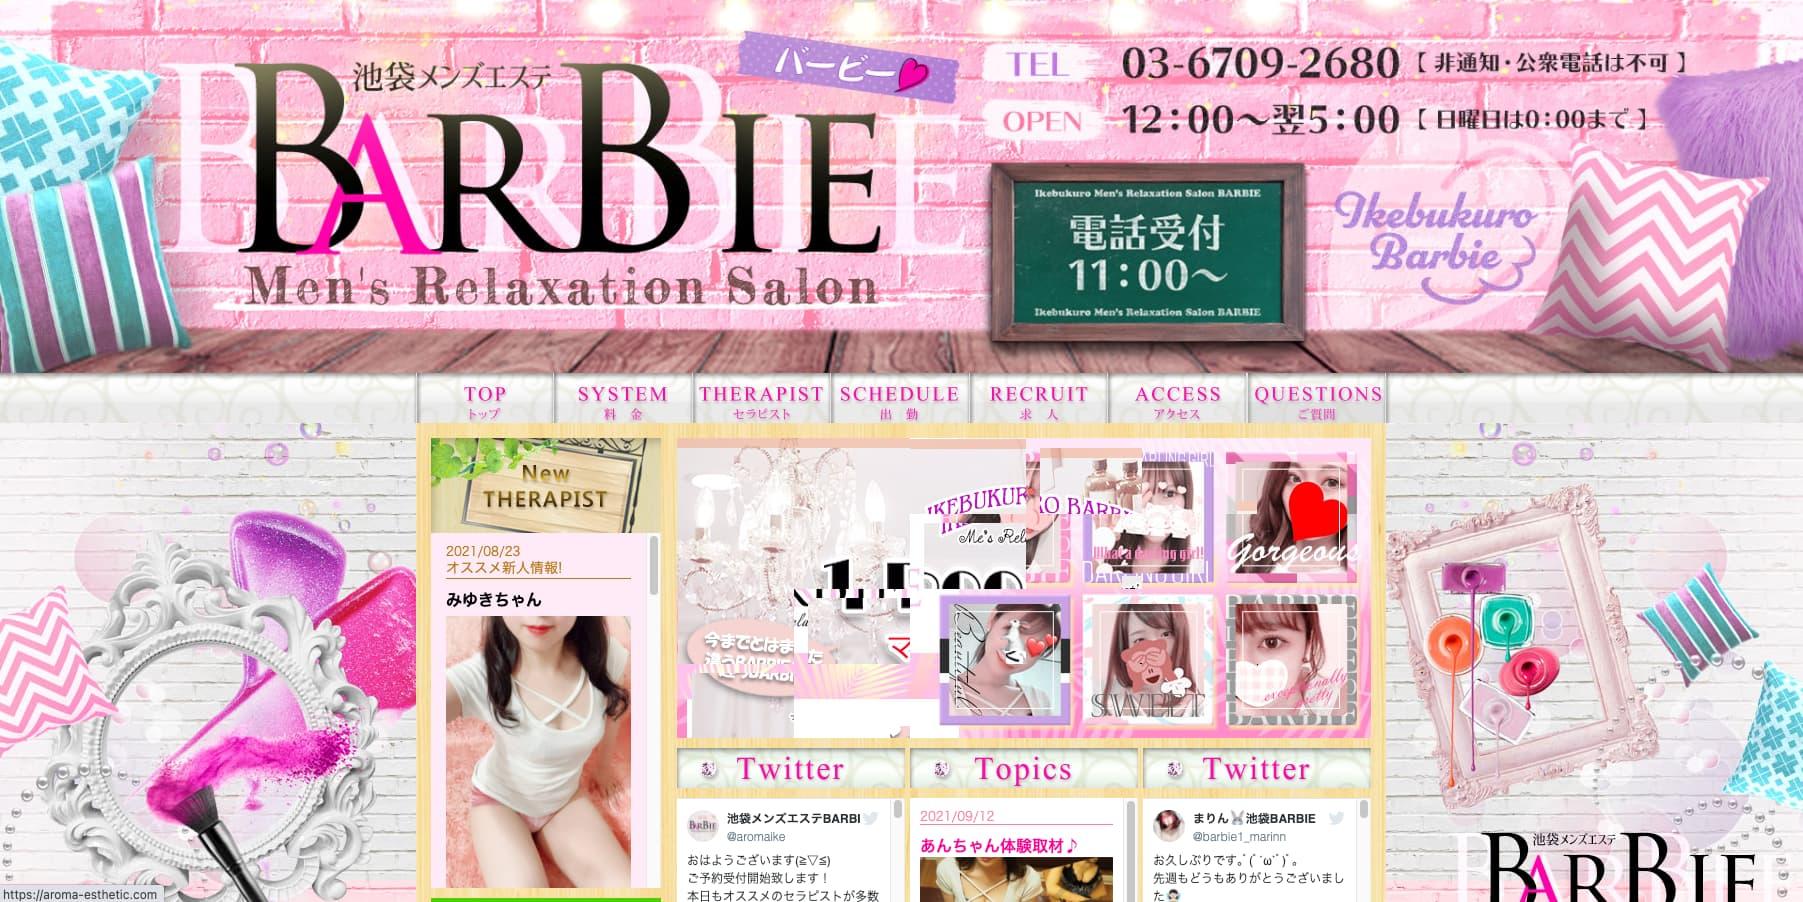 BARBIE(バービー)